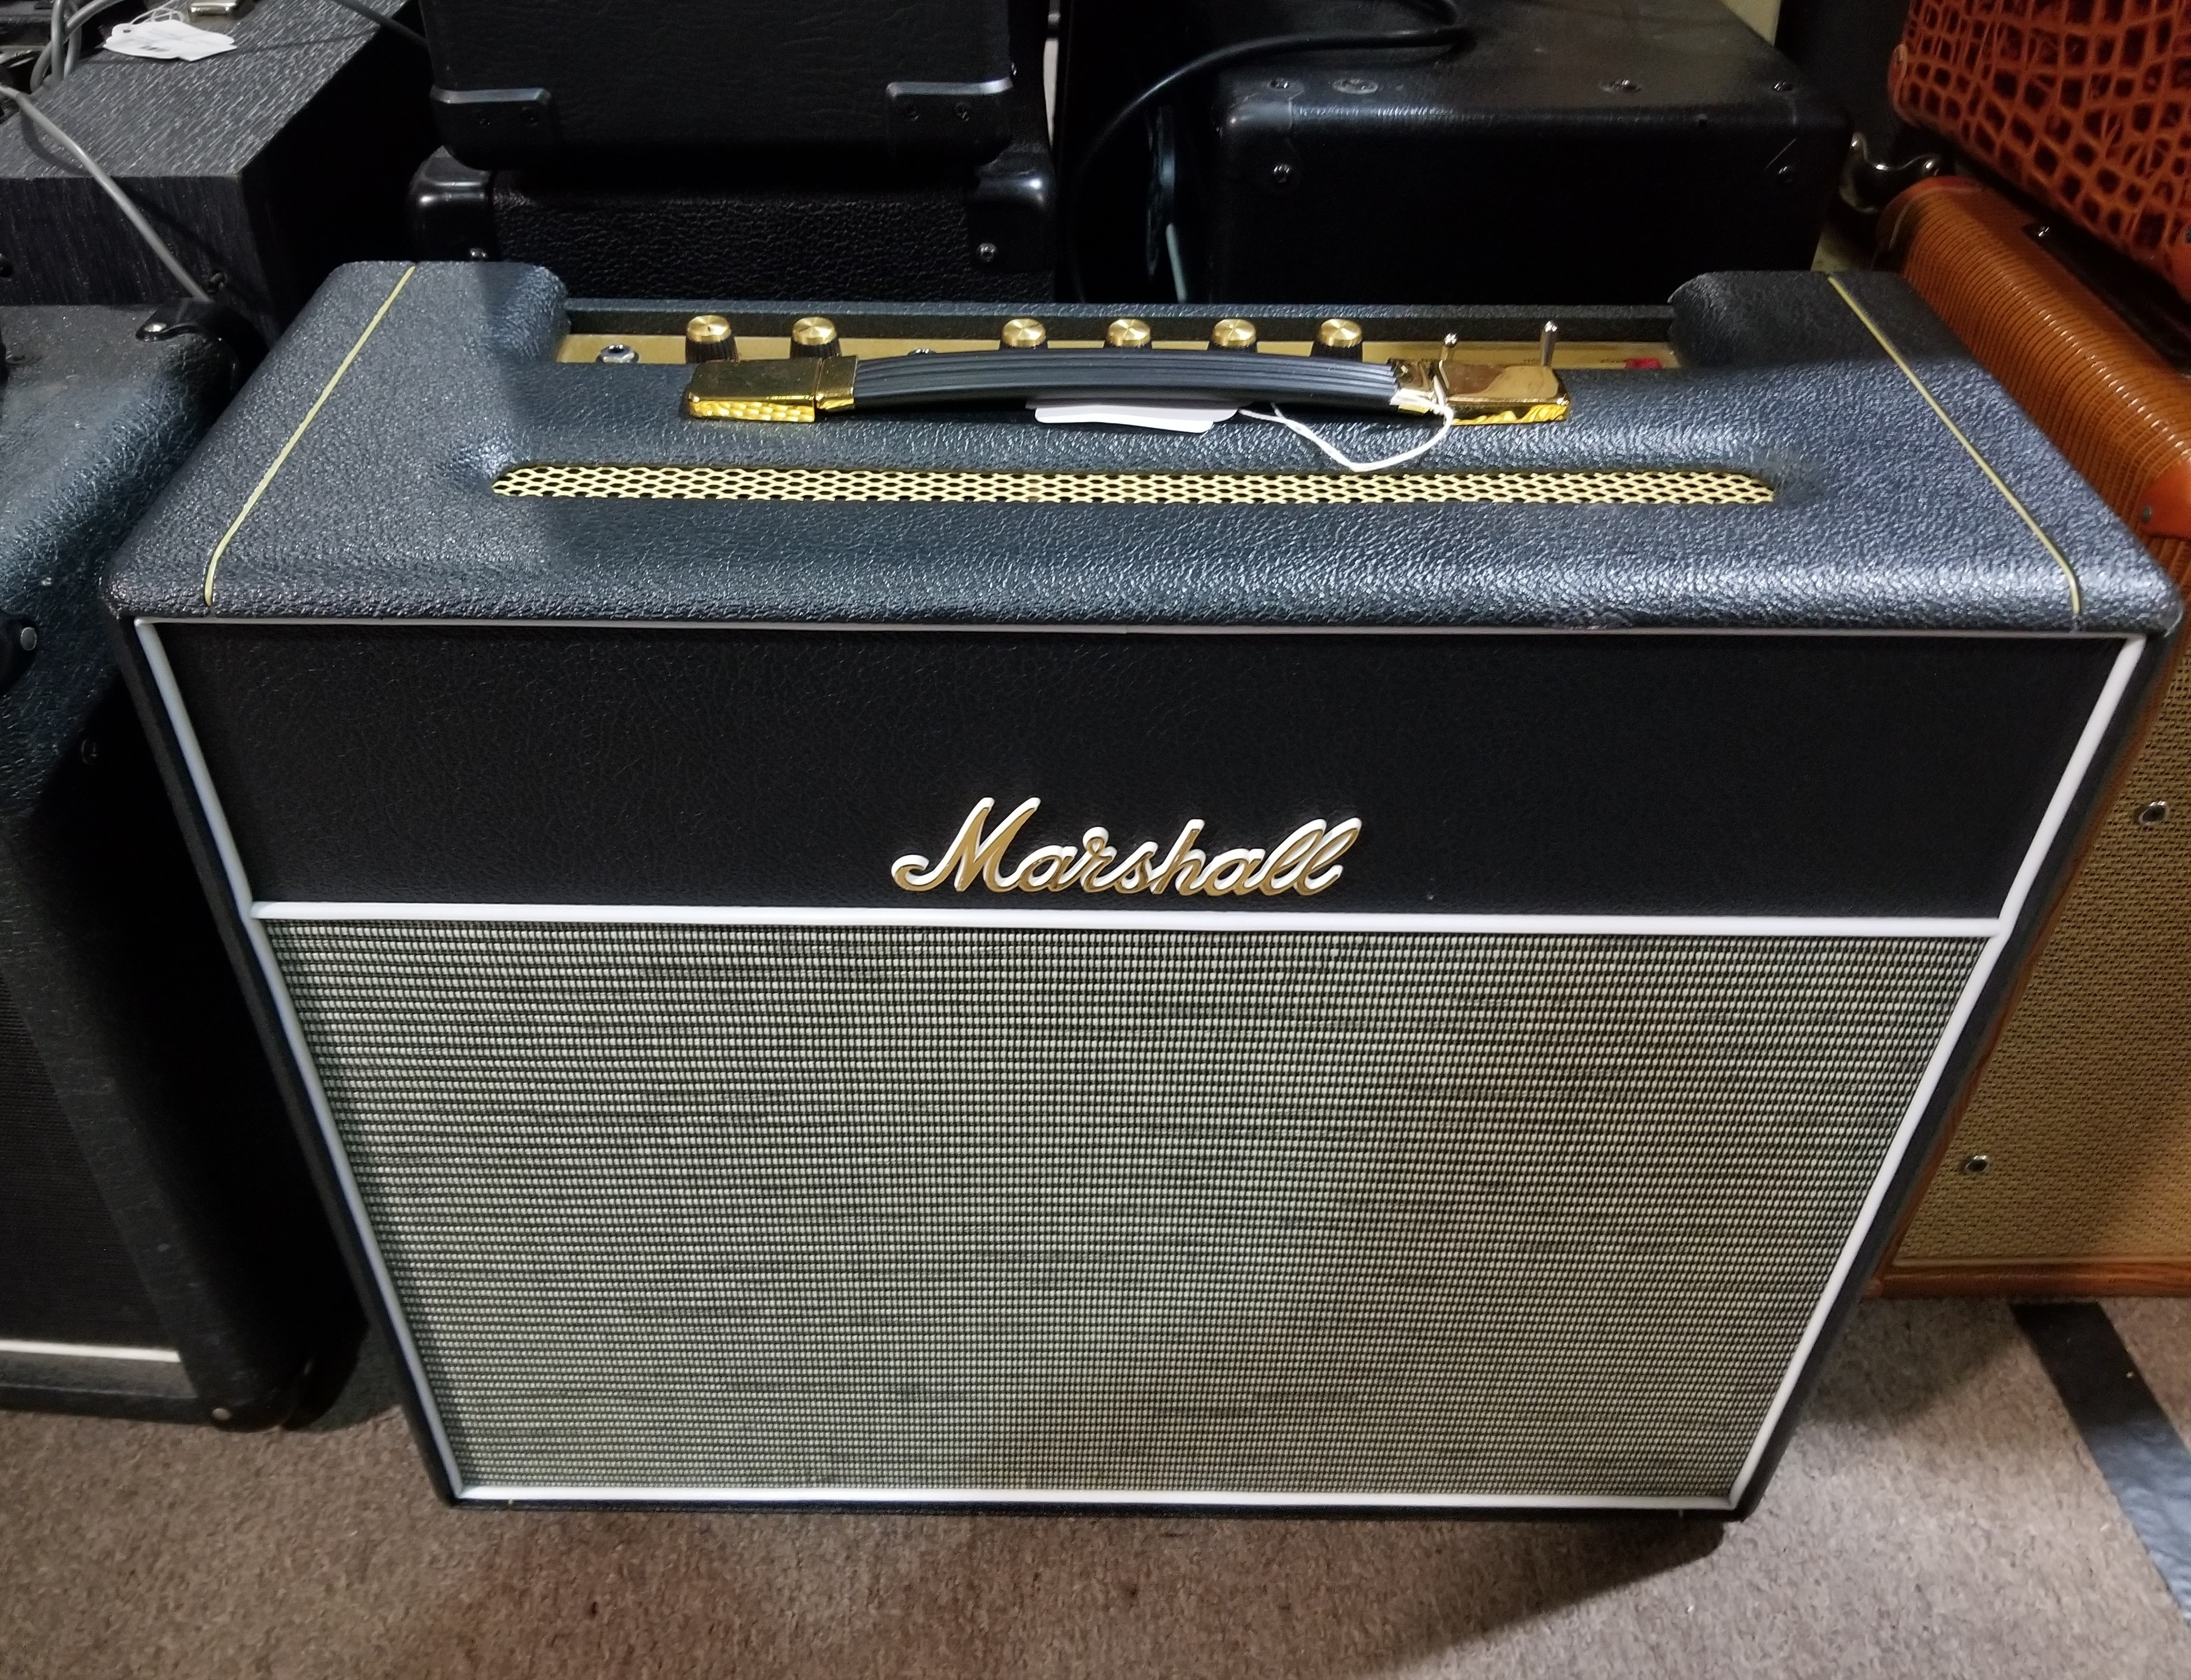 MARSHALL 1974X 1x12 18-Watt Tube Guitar Combo Amp - Local Pickup Only!